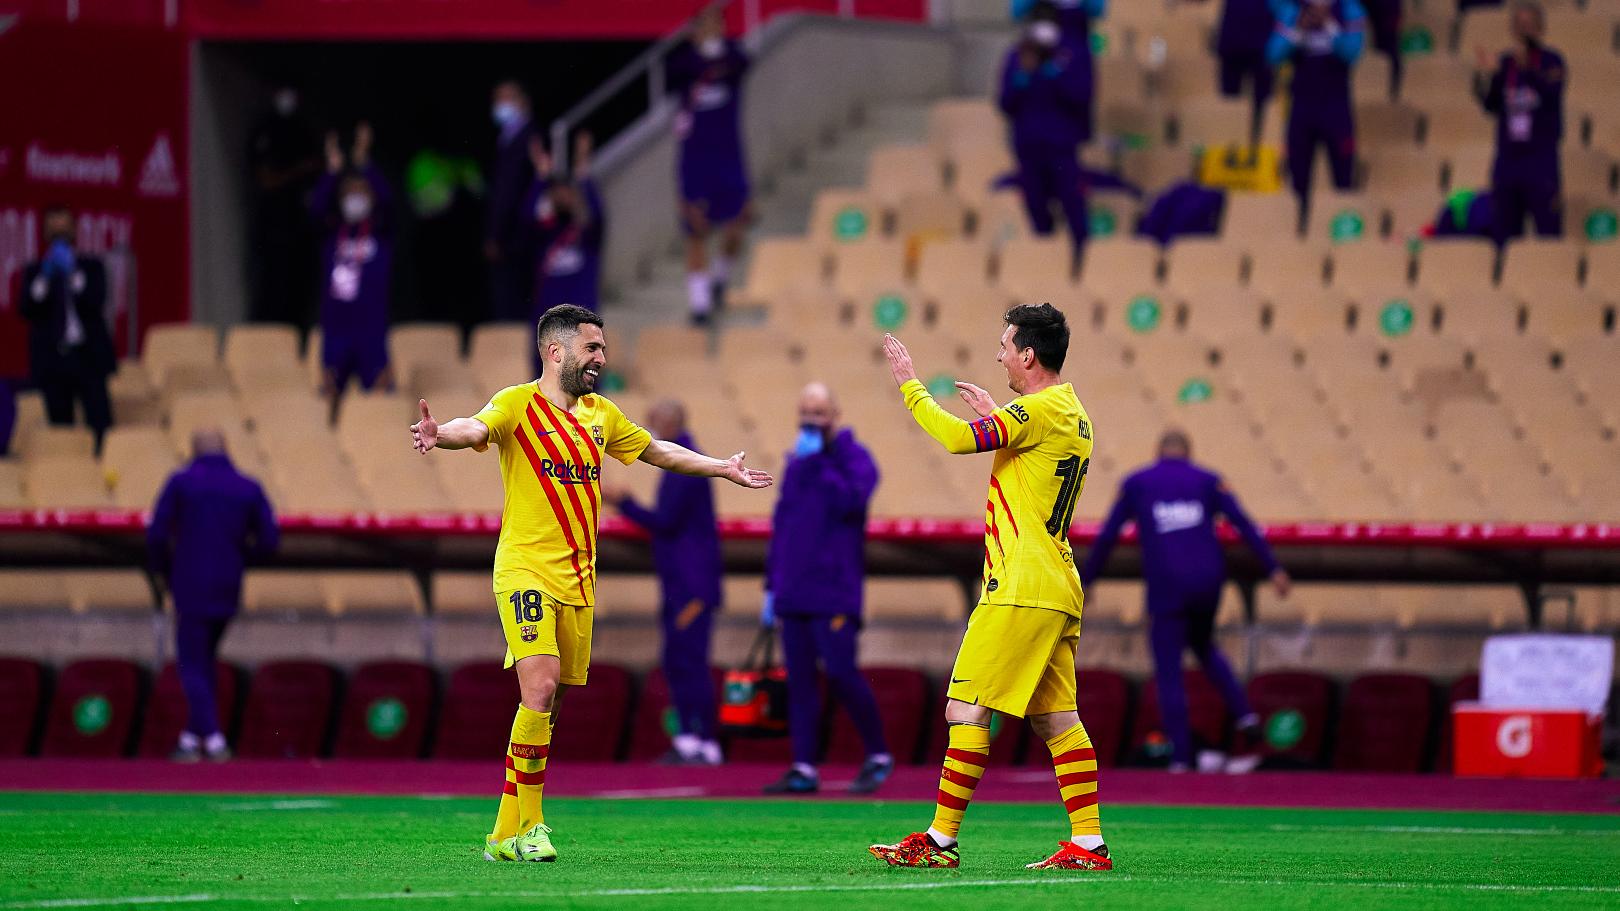 Jordi Alba Leo Messi Athletic Club Barcelona 04172021